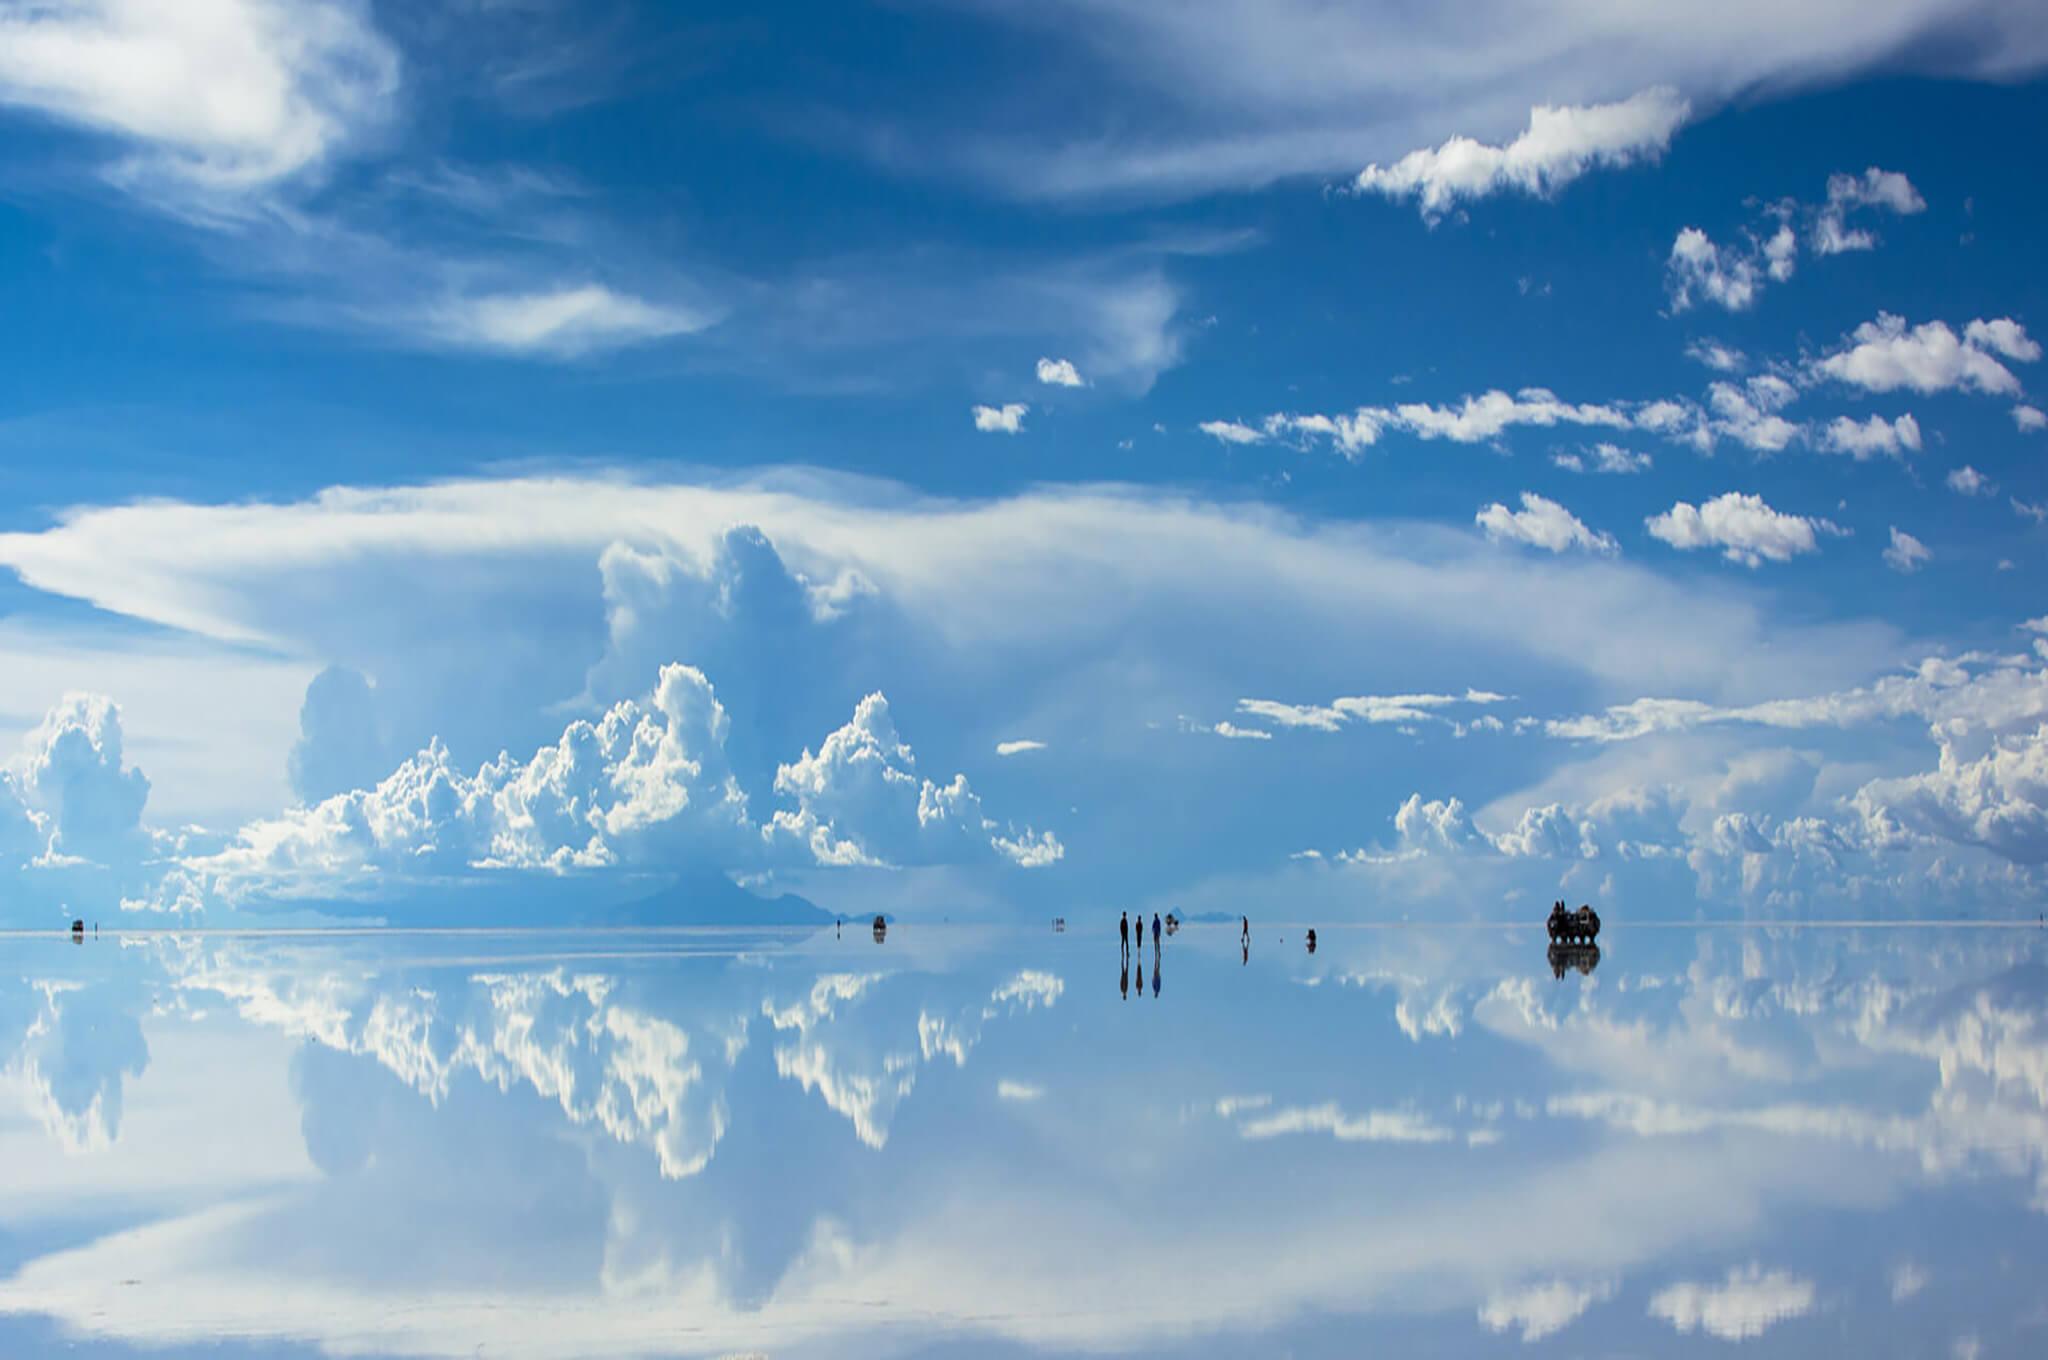 Looking Glass Falls Desktop Wallpaper Bolivia Uyuni Salt Flat Amp Potos 205 Innovart Tours